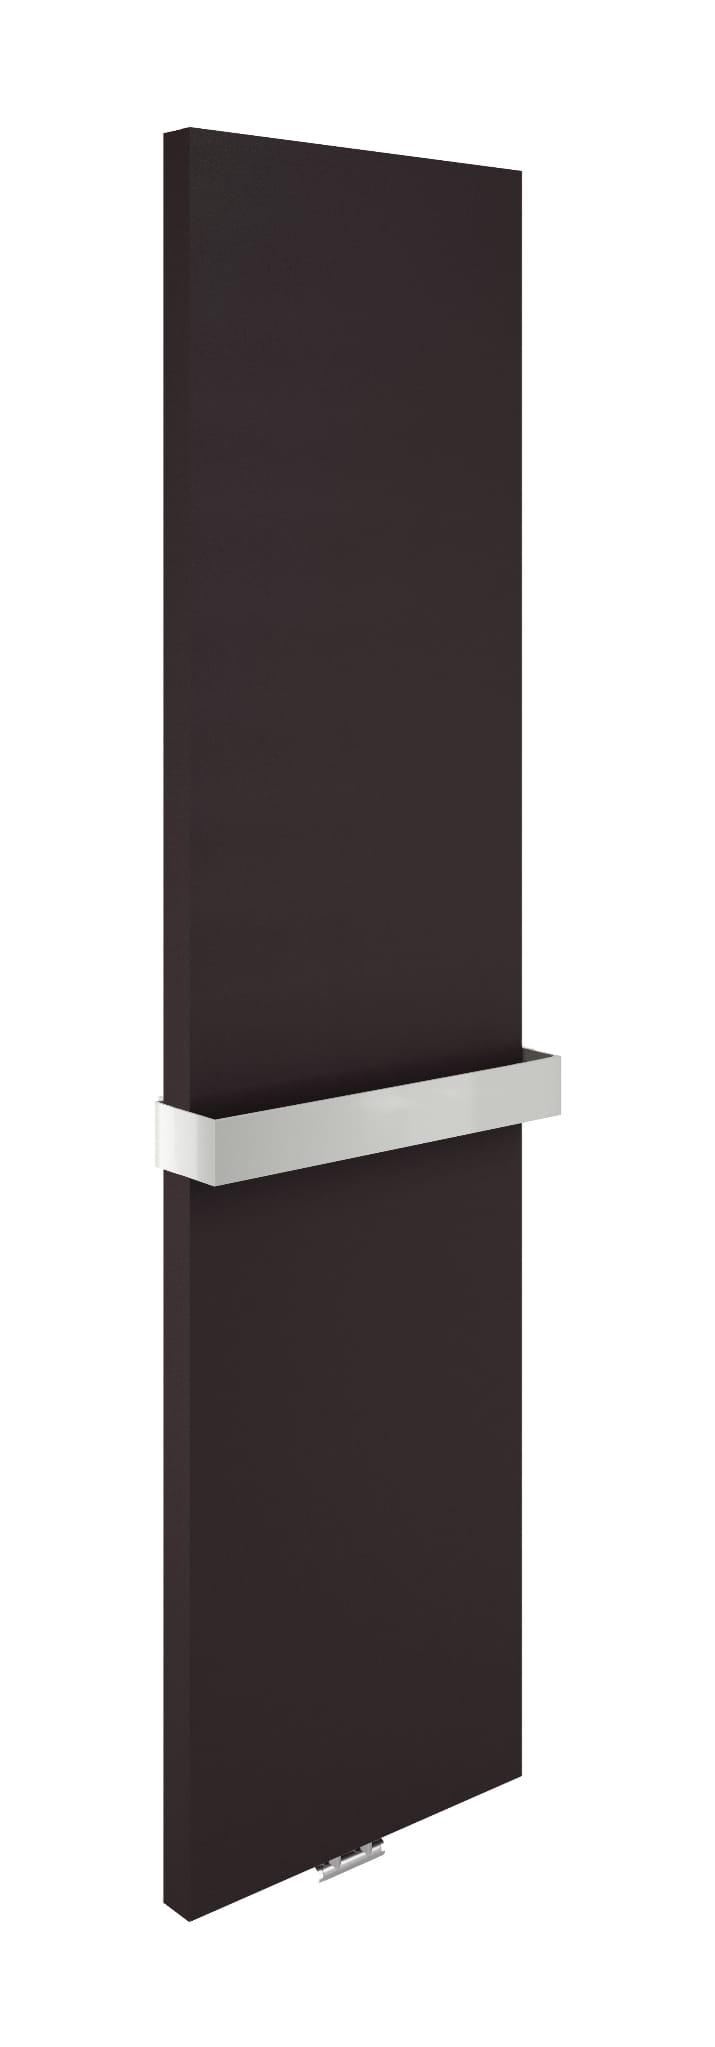 Sanotechnik - NEUSTADT - Dekoratívny kúpeľňový radiátor antracit 45 x 180 cm